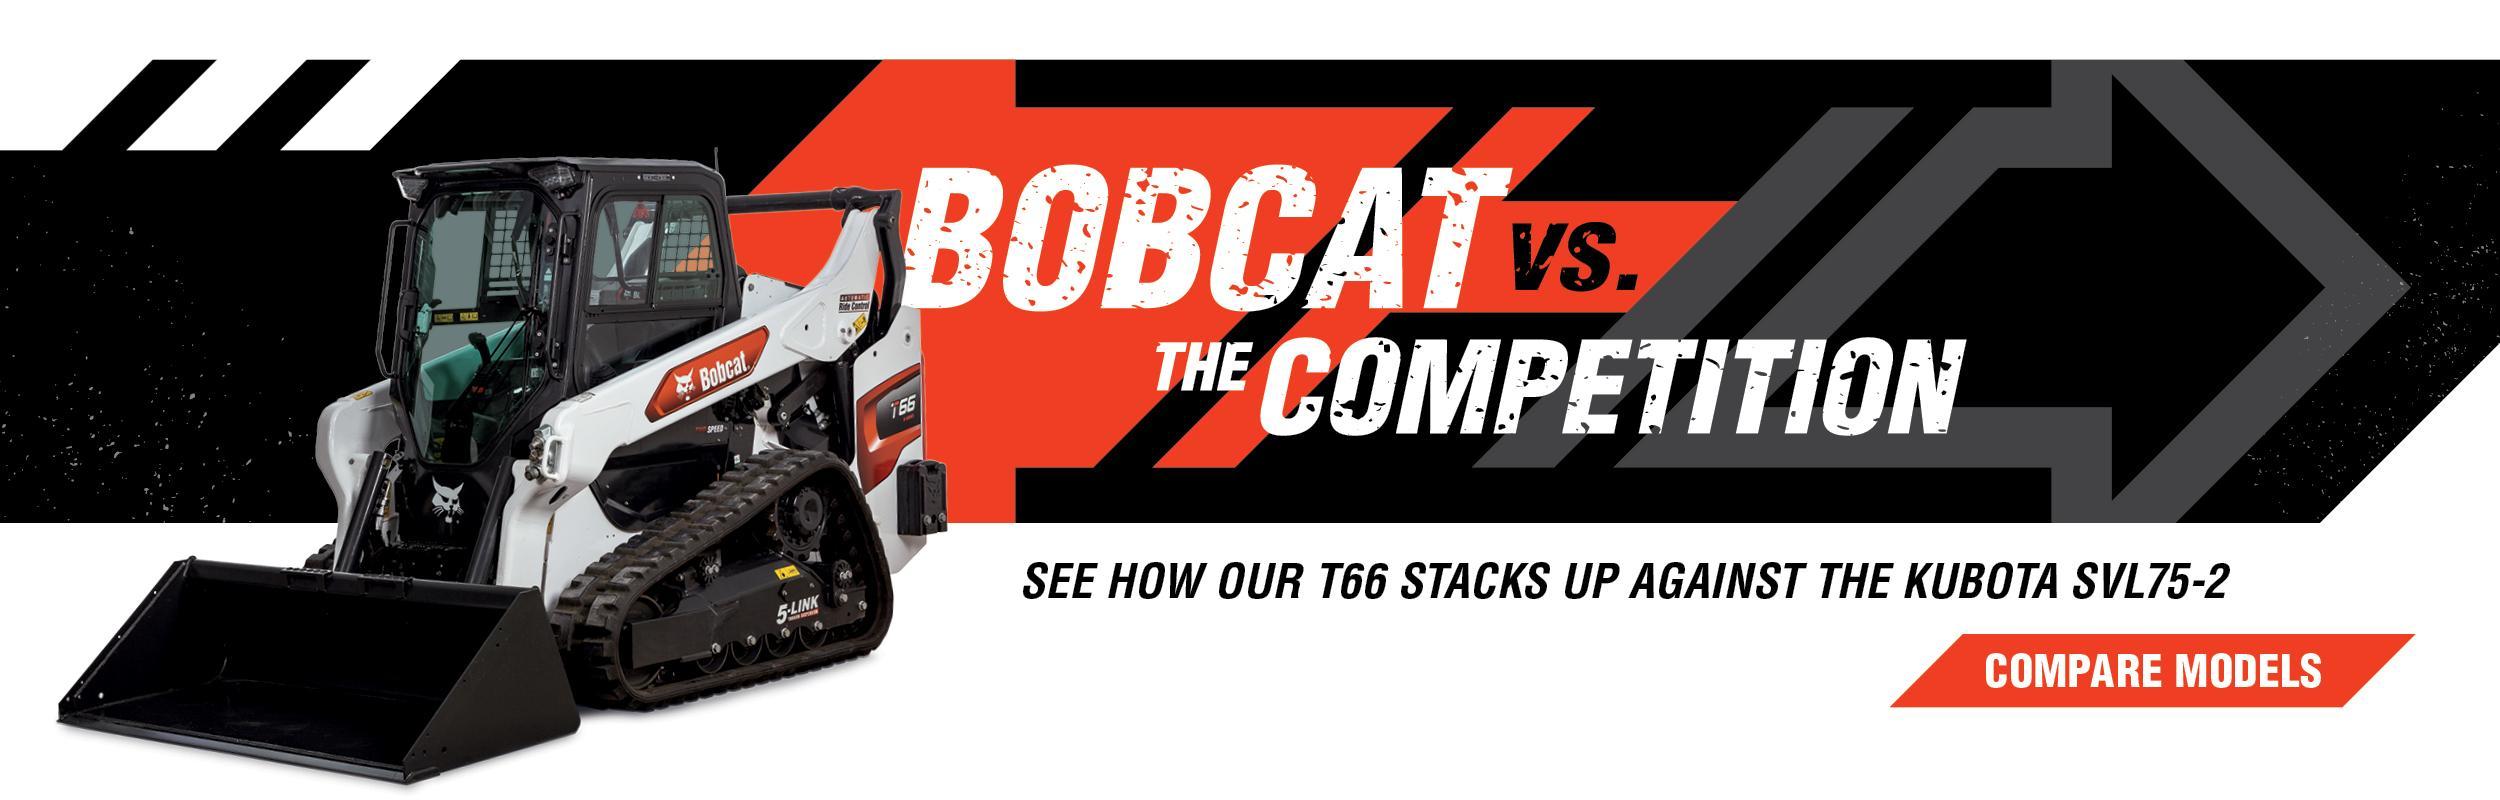 Bobcat T66 Compact Loaders Vs. Kubota SVL75-2 Compare Models Banner